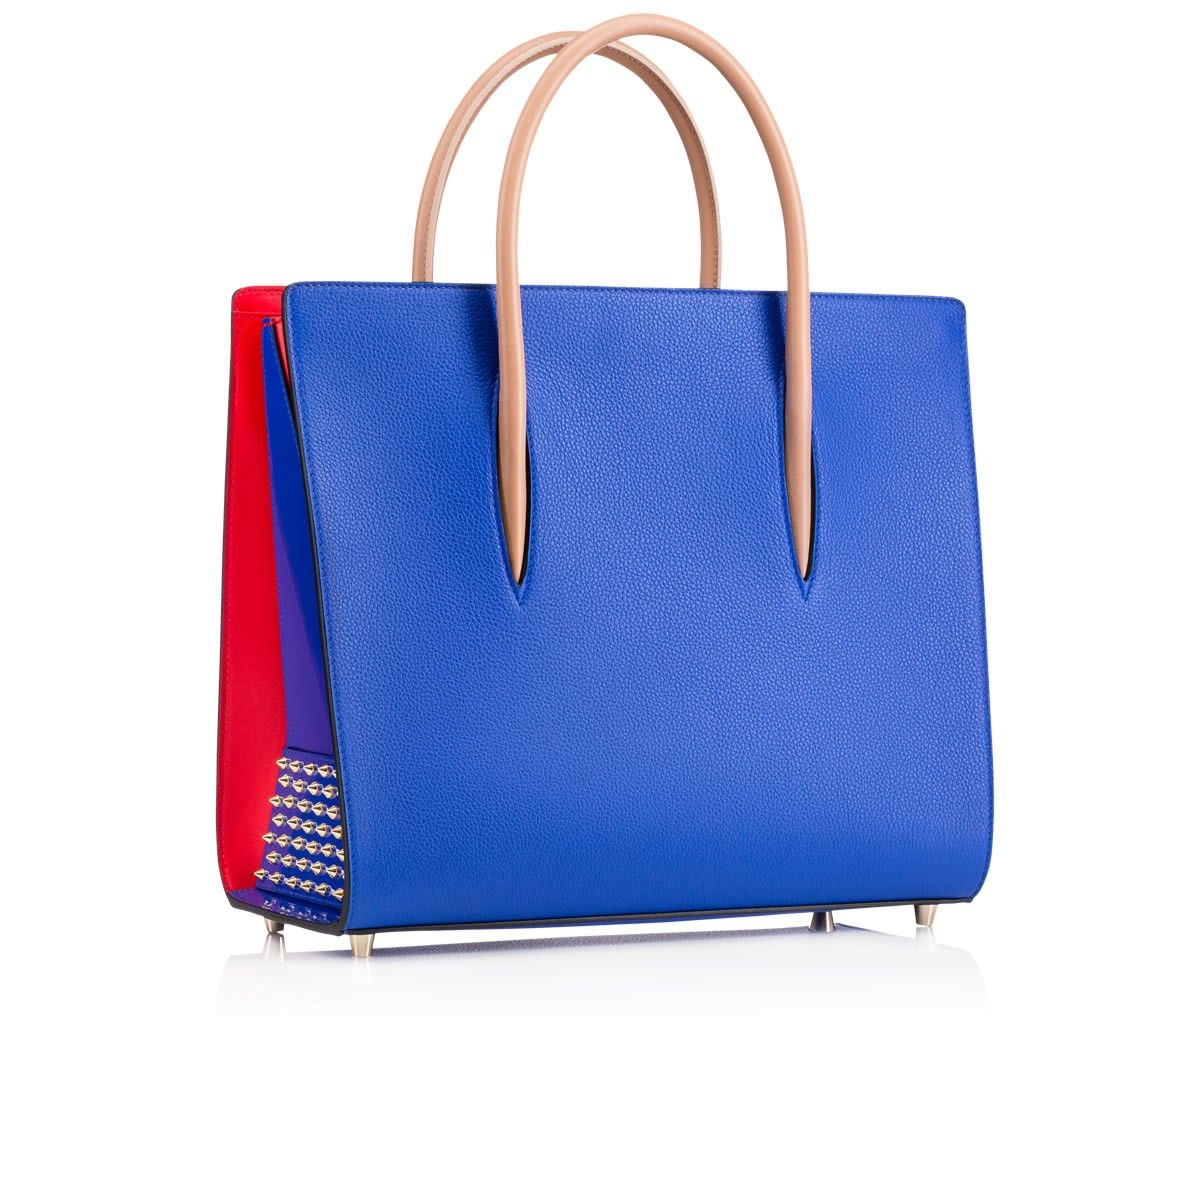 d081c18f78 Women Bags - Paloma Large Tote Bag - Christian Louboutin